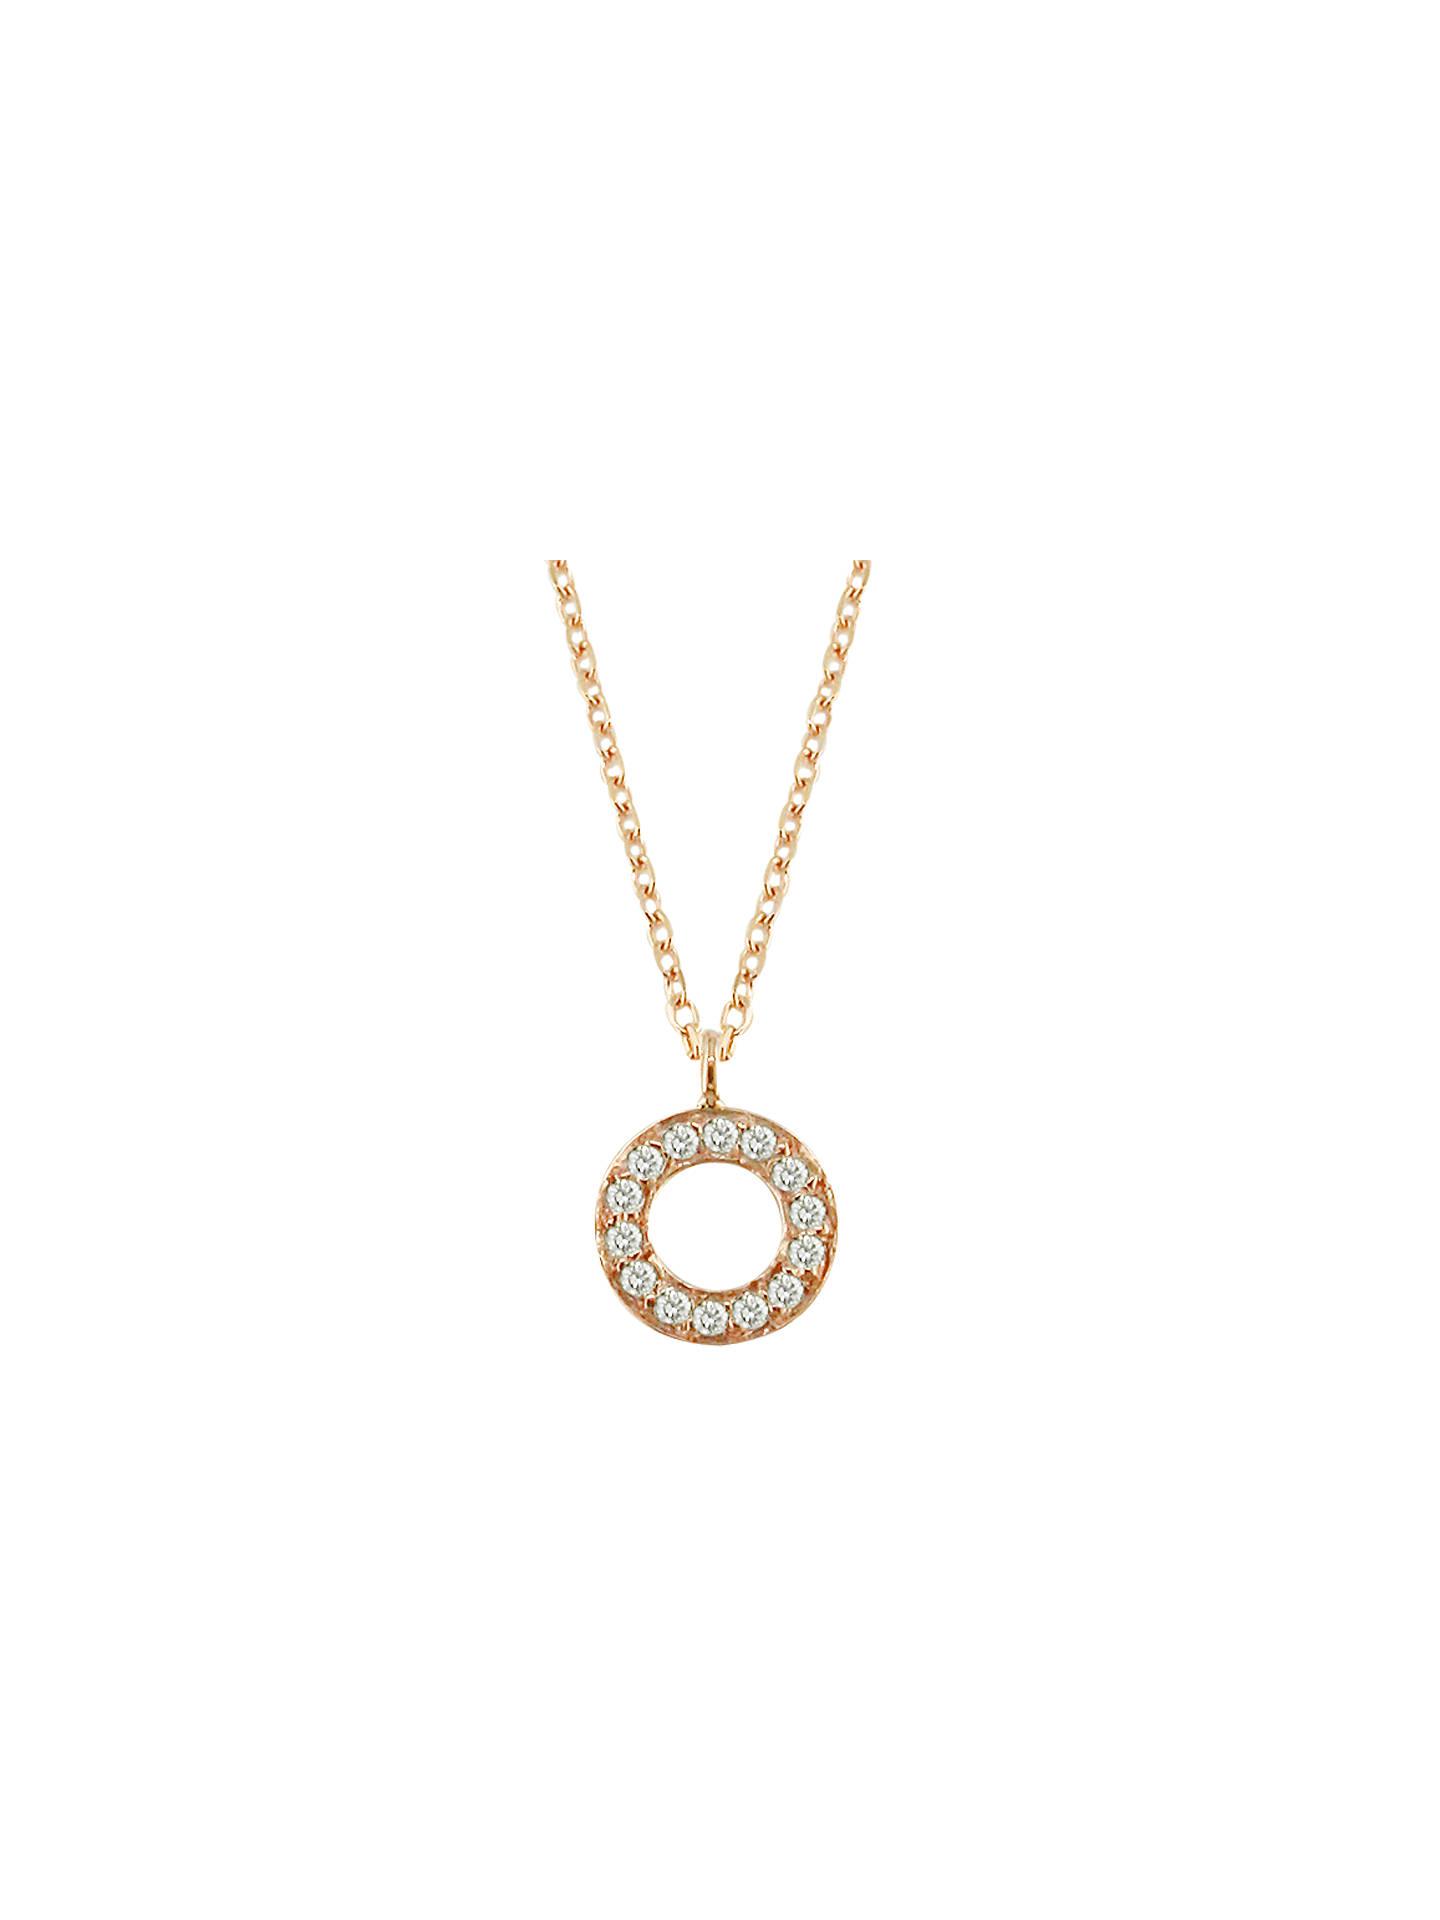 London Road Meridian 9ct Gold Diamond Set Circle Pendant